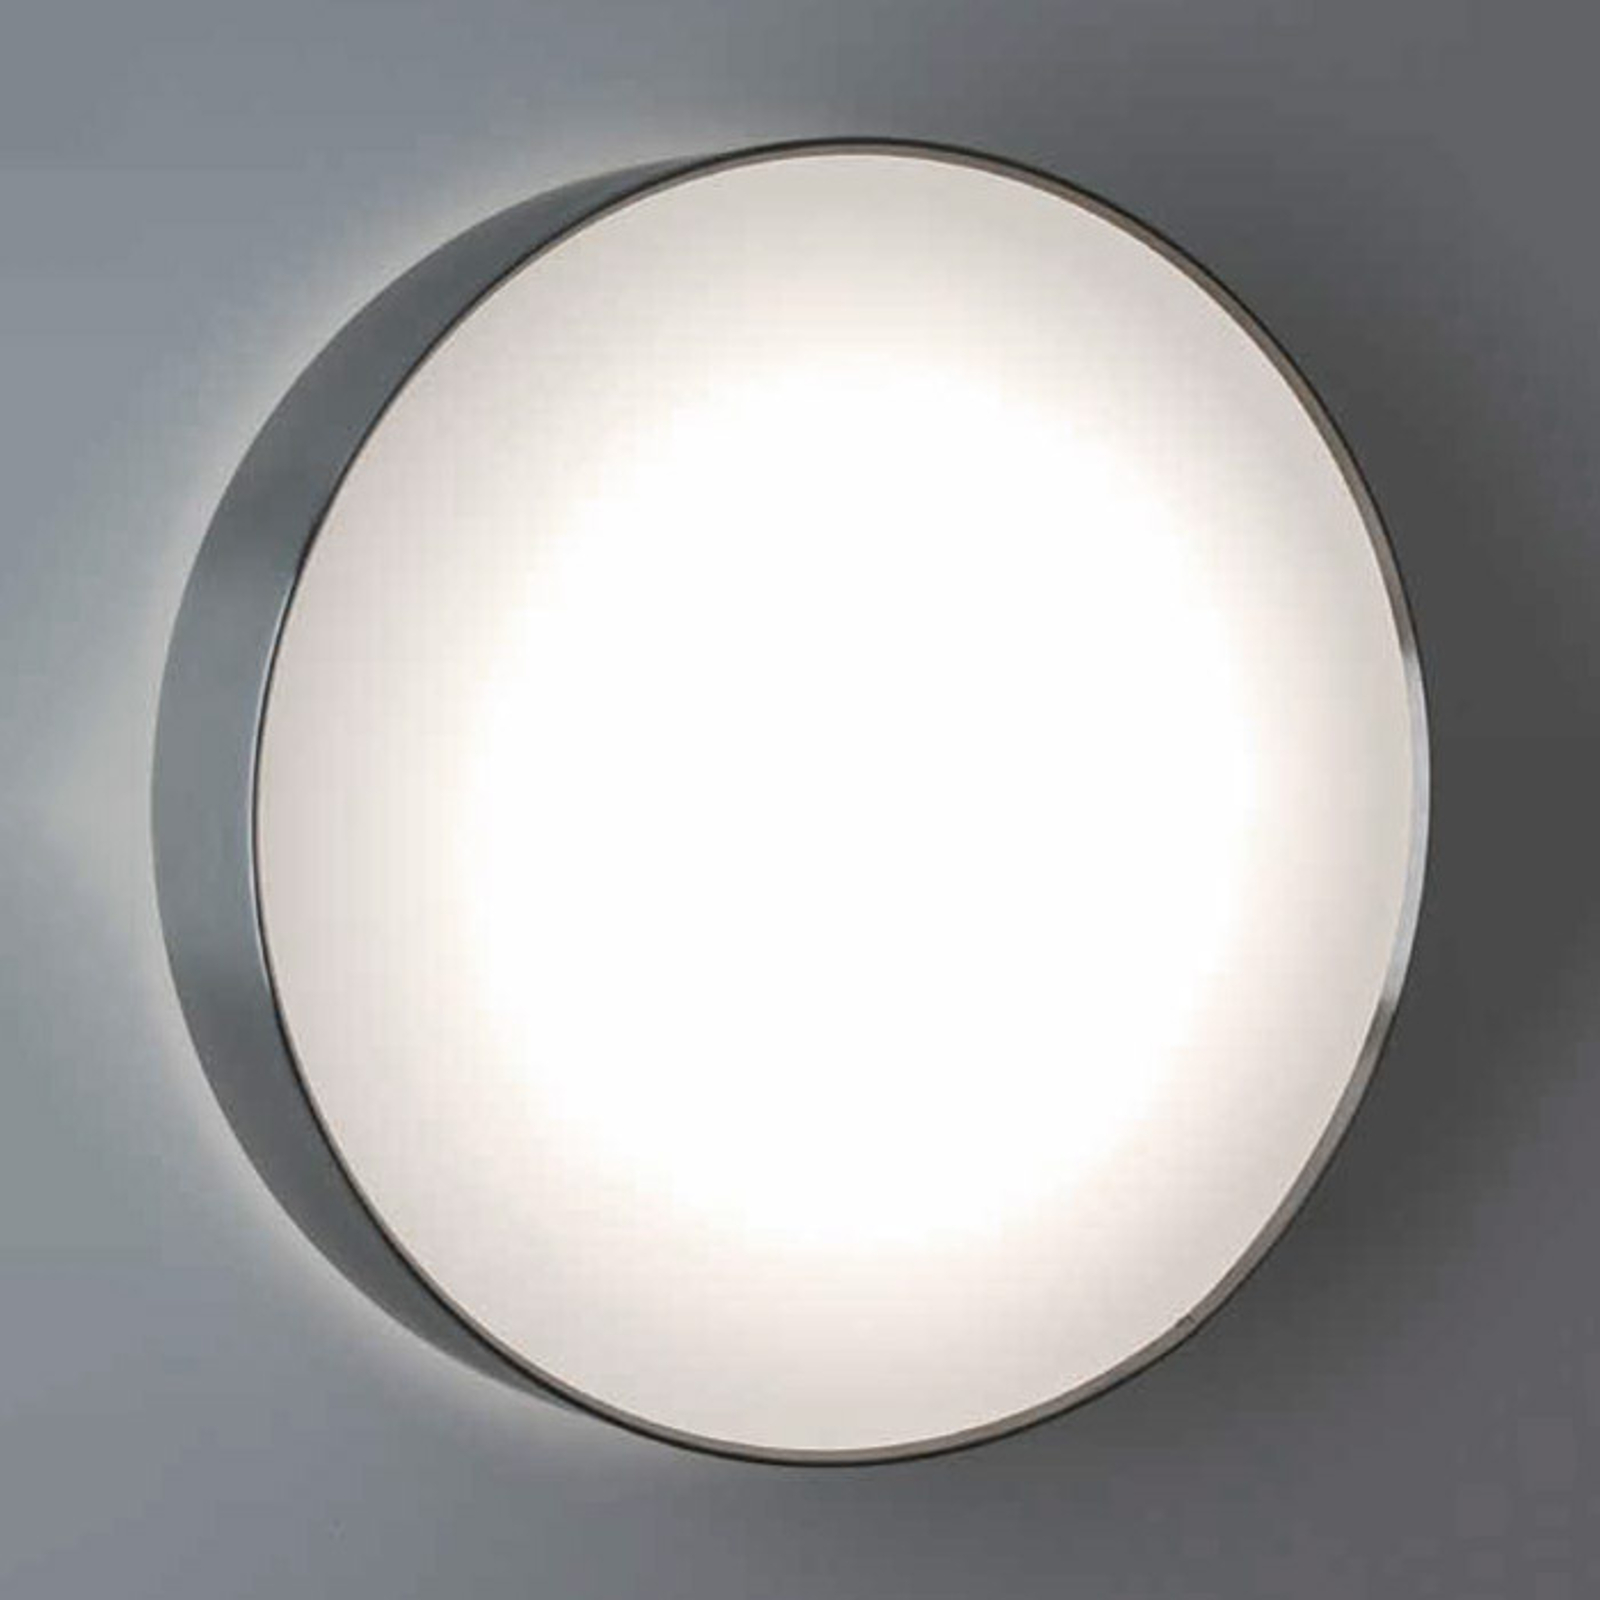 Lampa sufitowa SUN 4 LED stal szlachetna 8W 4K